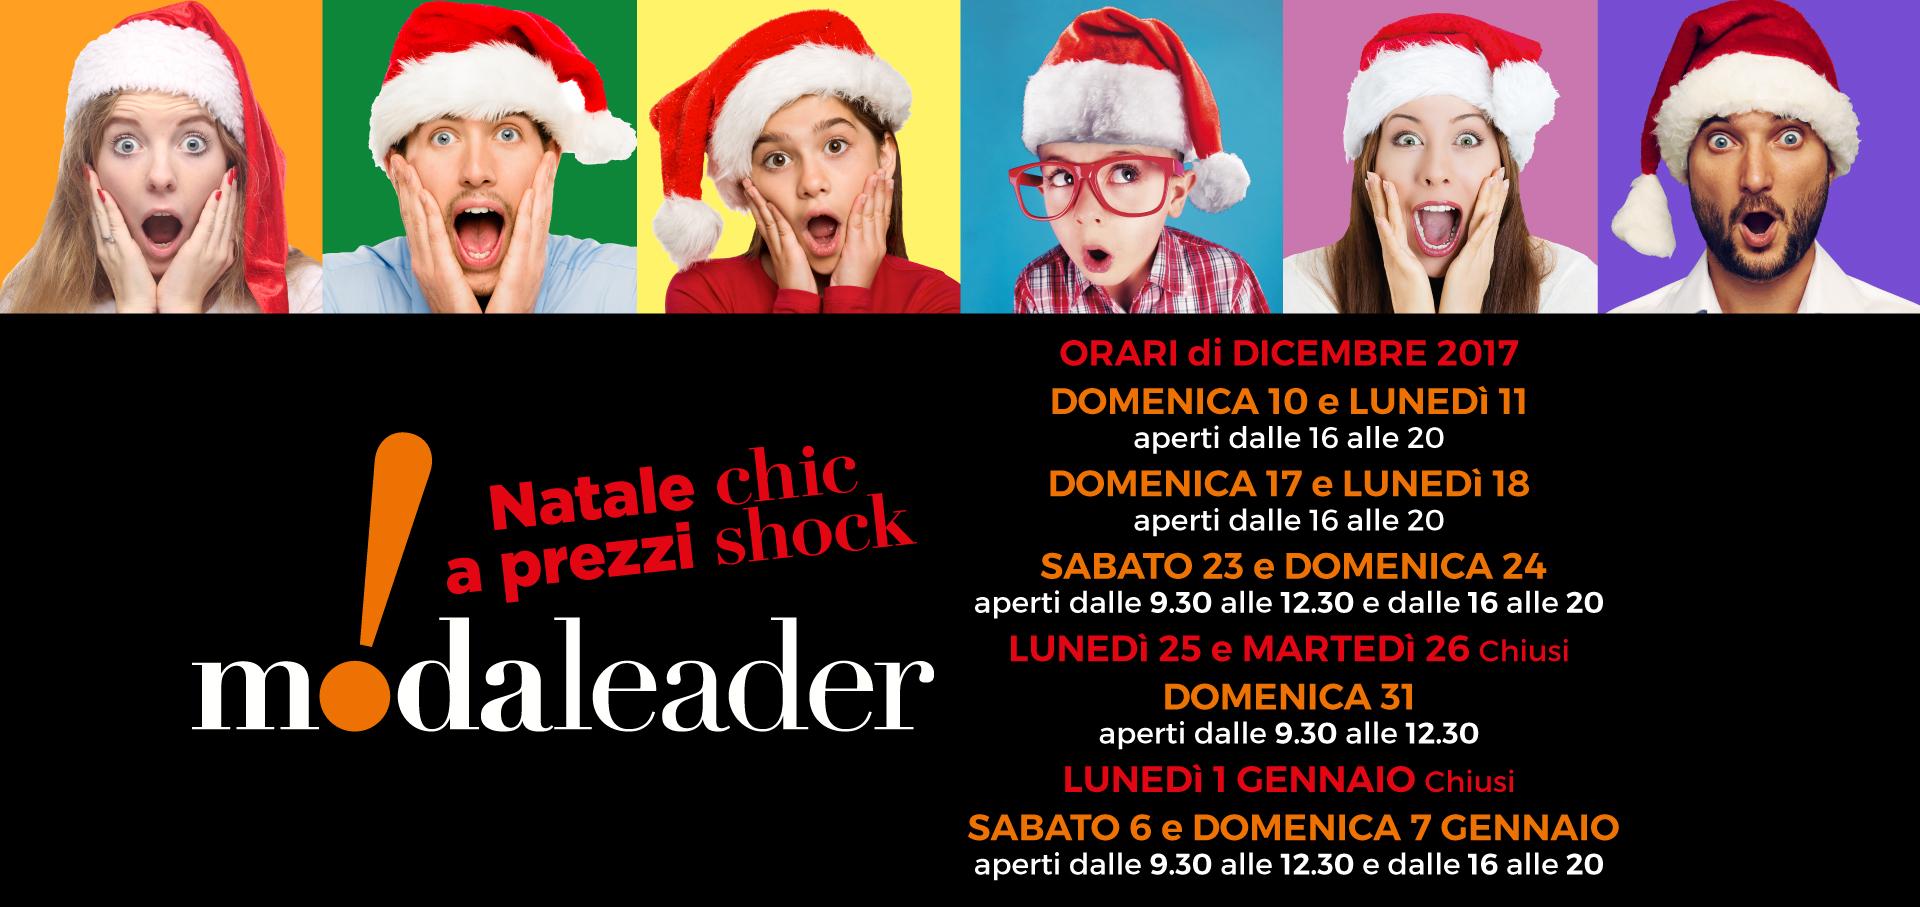 banner-sito-modaleader-Natale